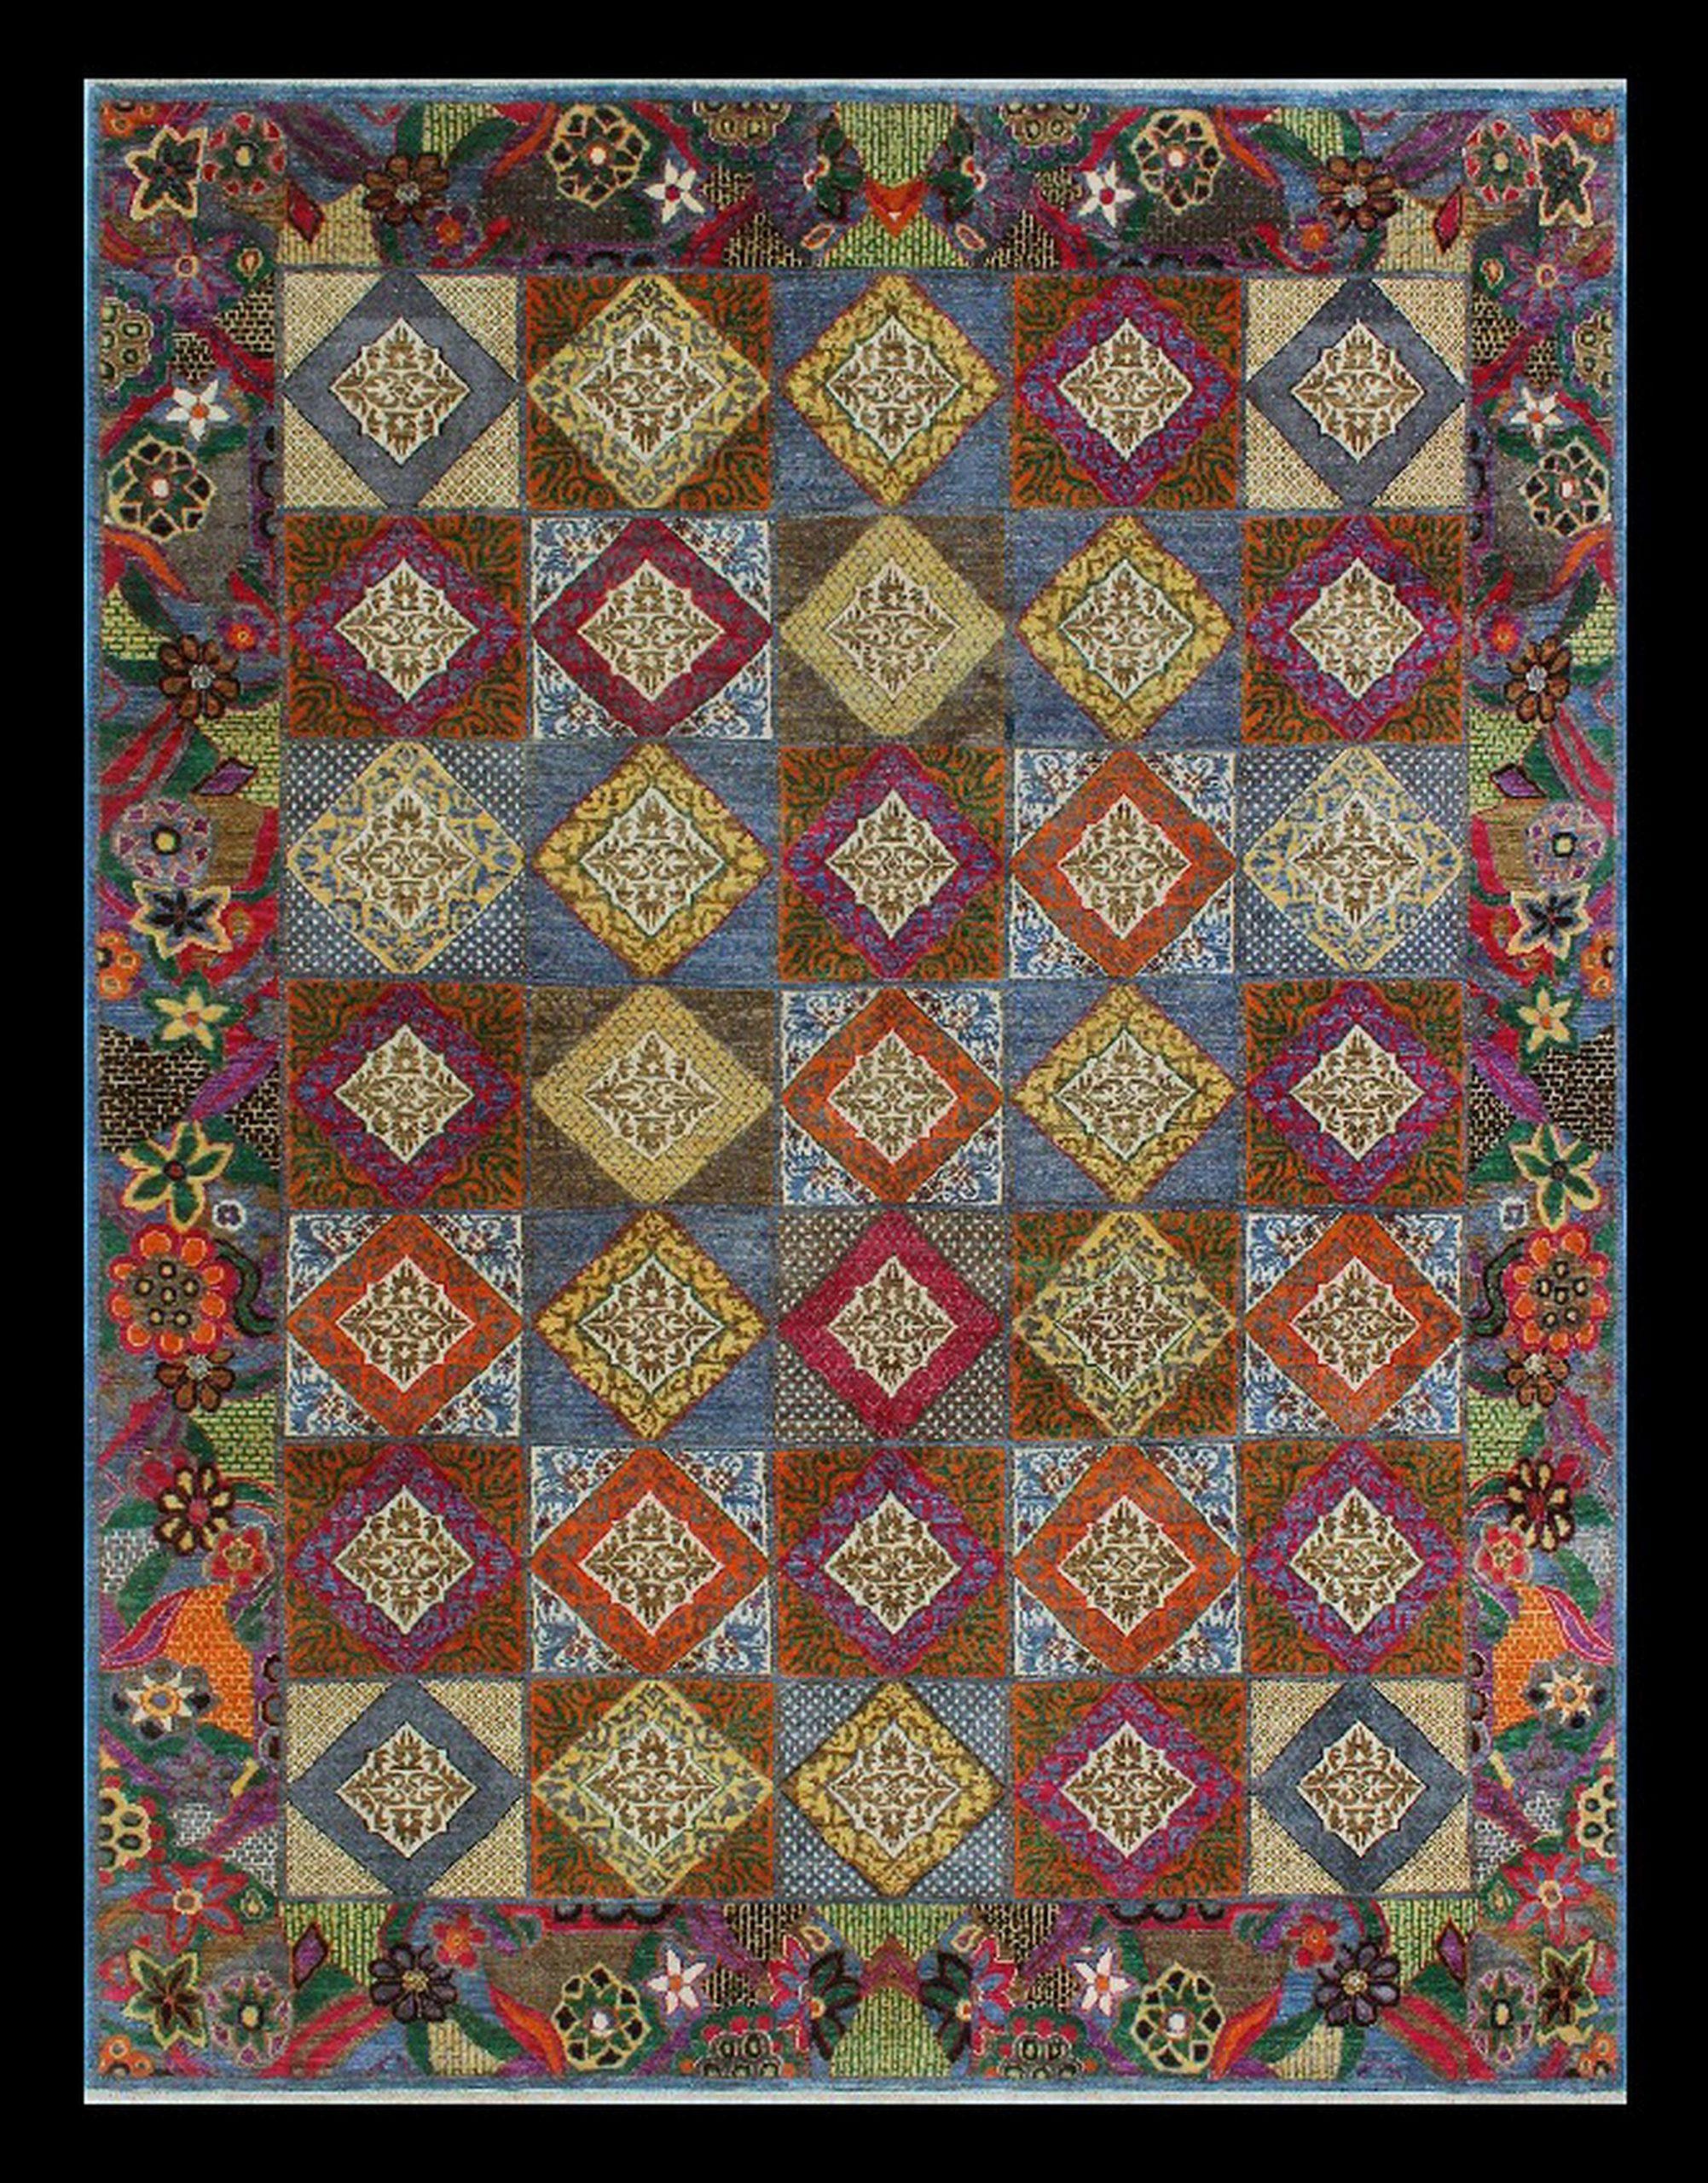 N8658 PAKISTAN ARTS AND CRAFTS 8 X 10.5_1